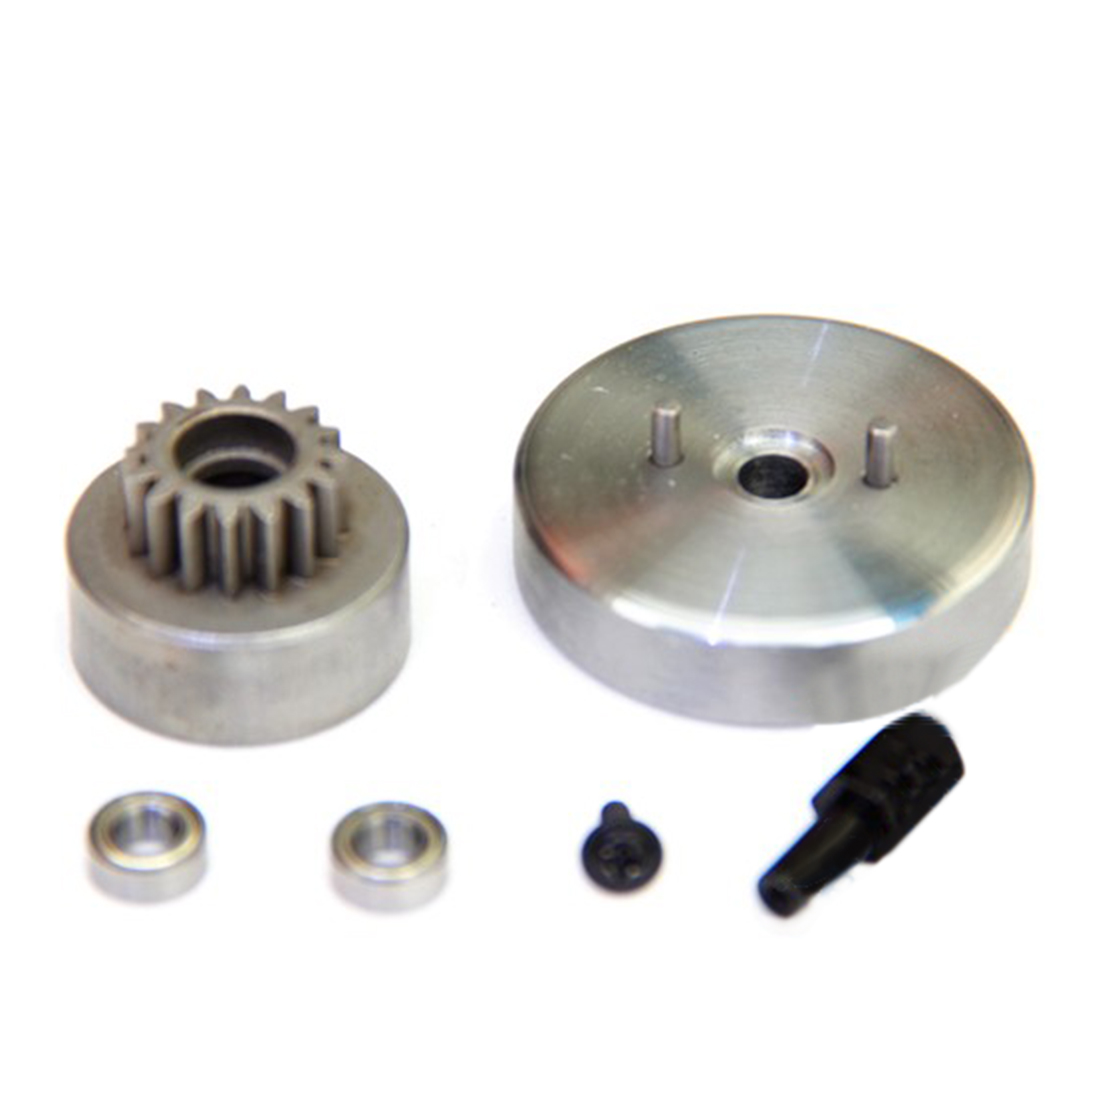 Toyan Engine Single Gear Clutch Modified Kit For Toyan FS-S100G FS-S100G(W